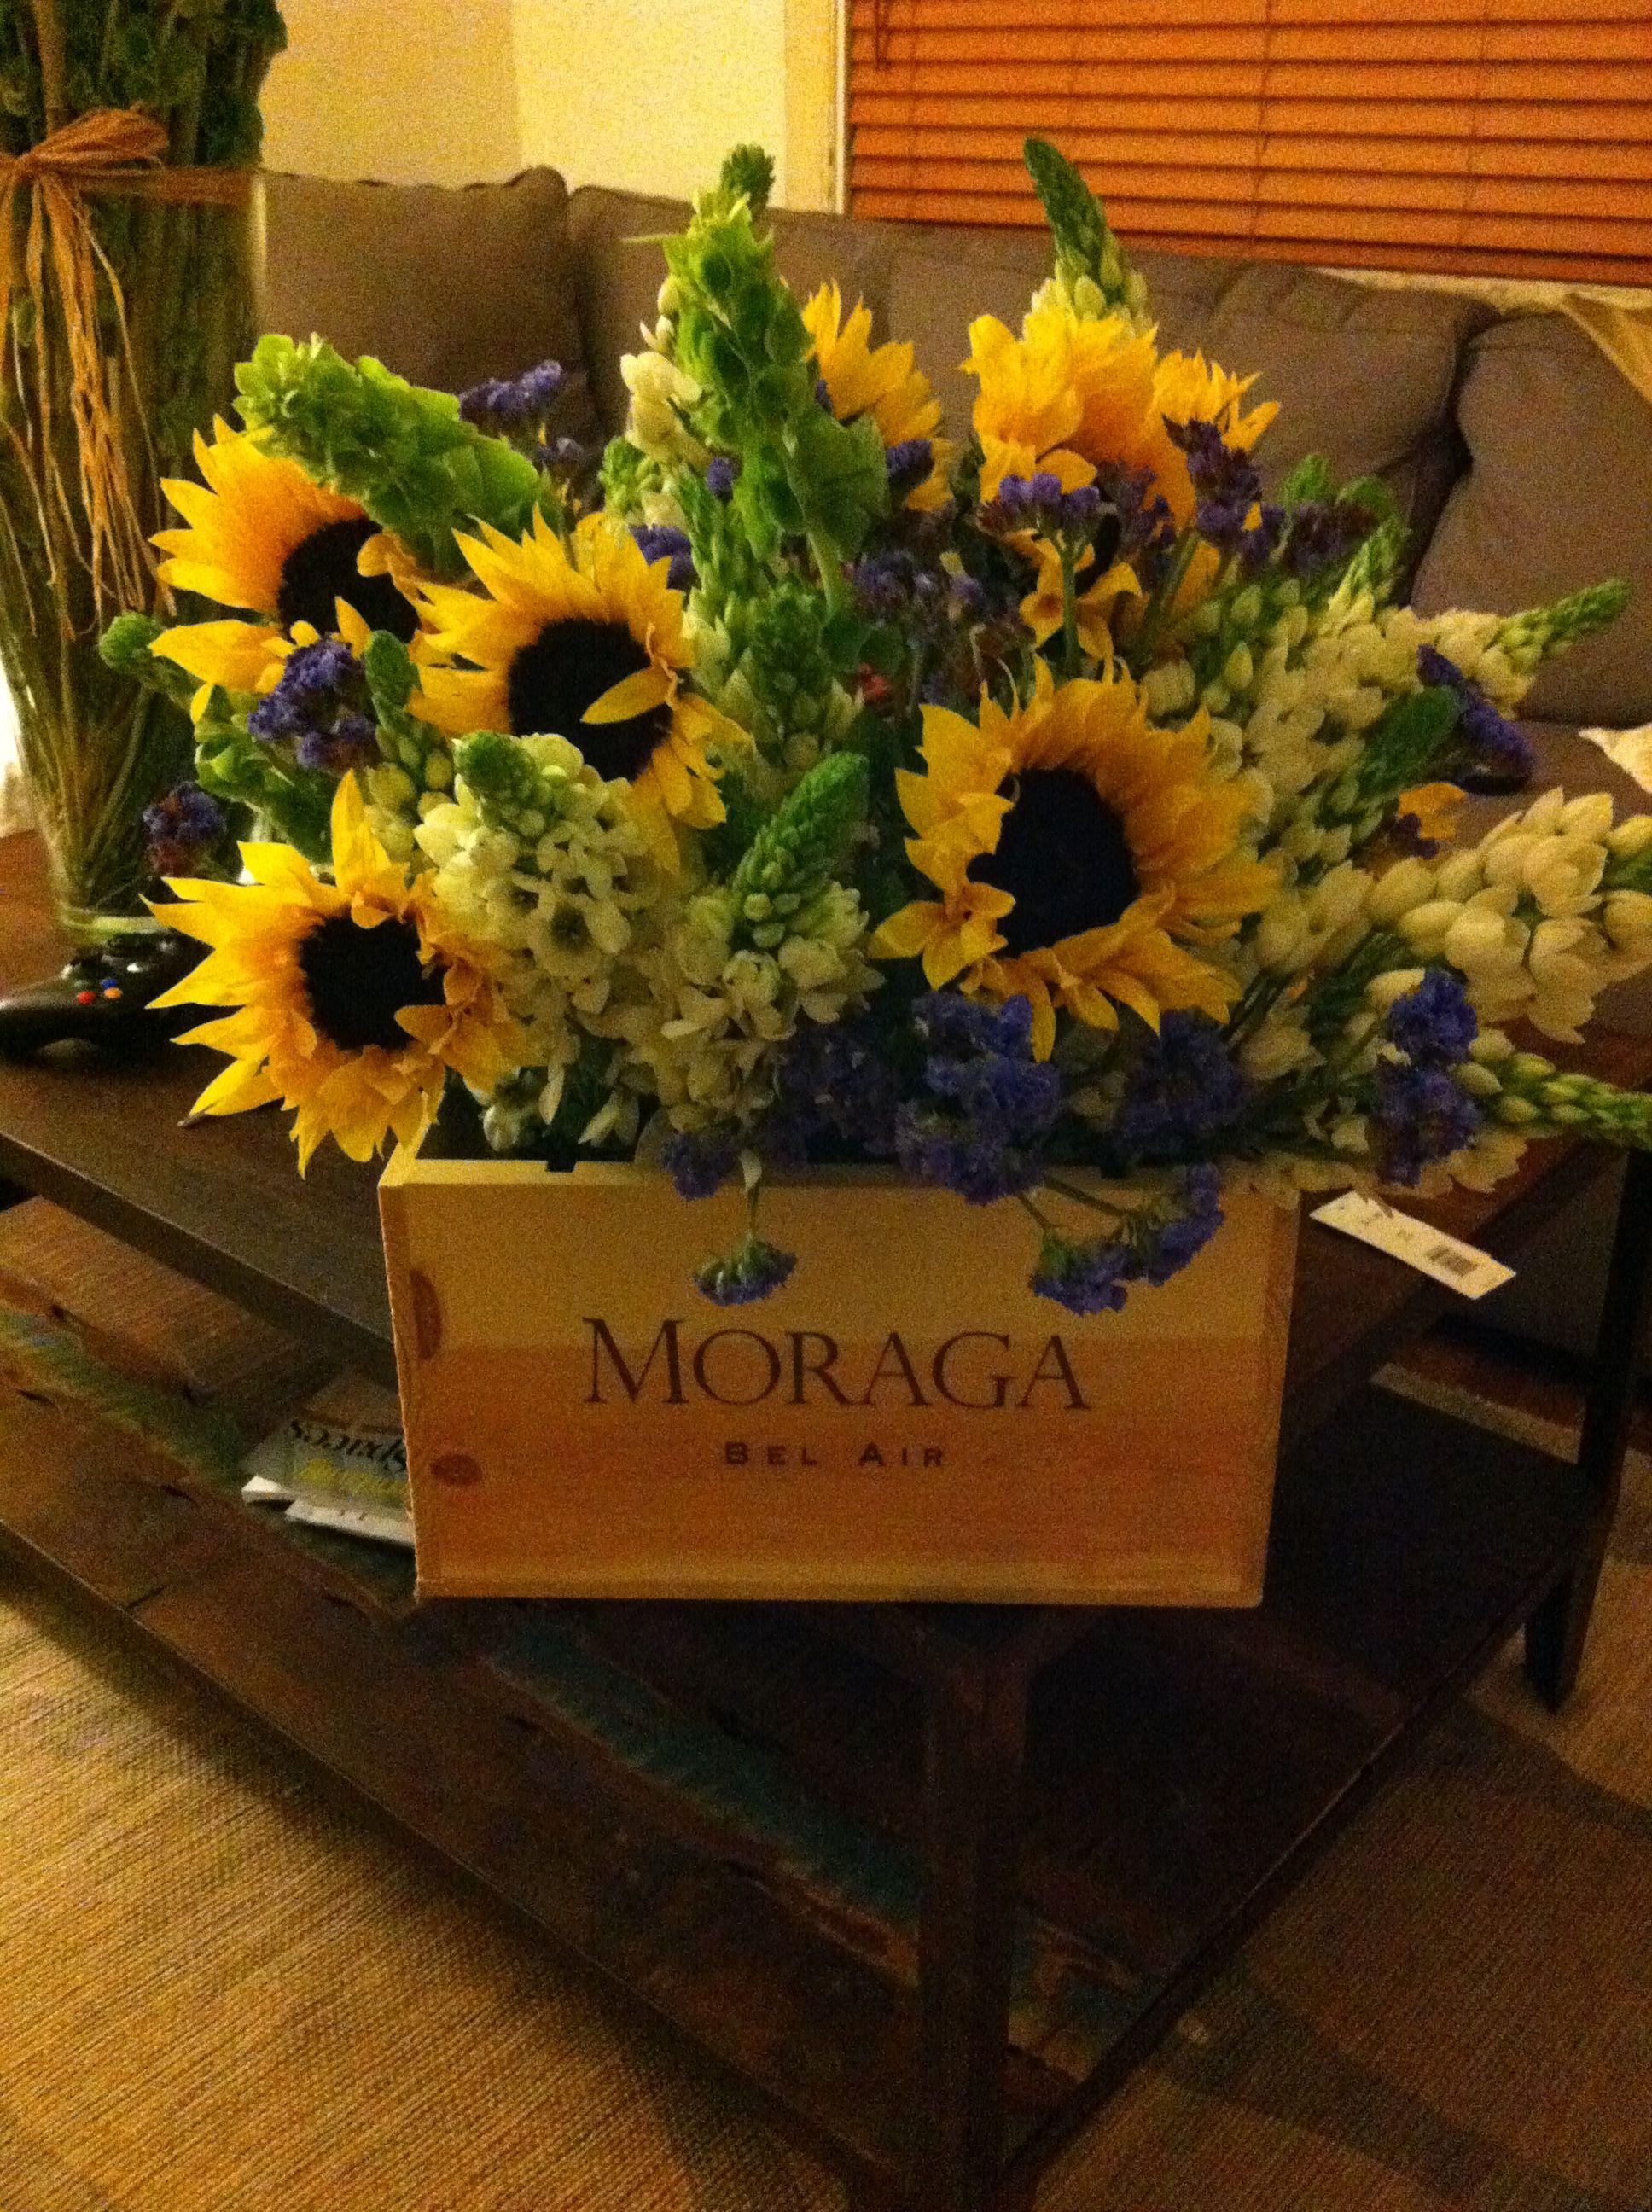 Moraga wine crate. Made by me ) Wine crate, Diy wine